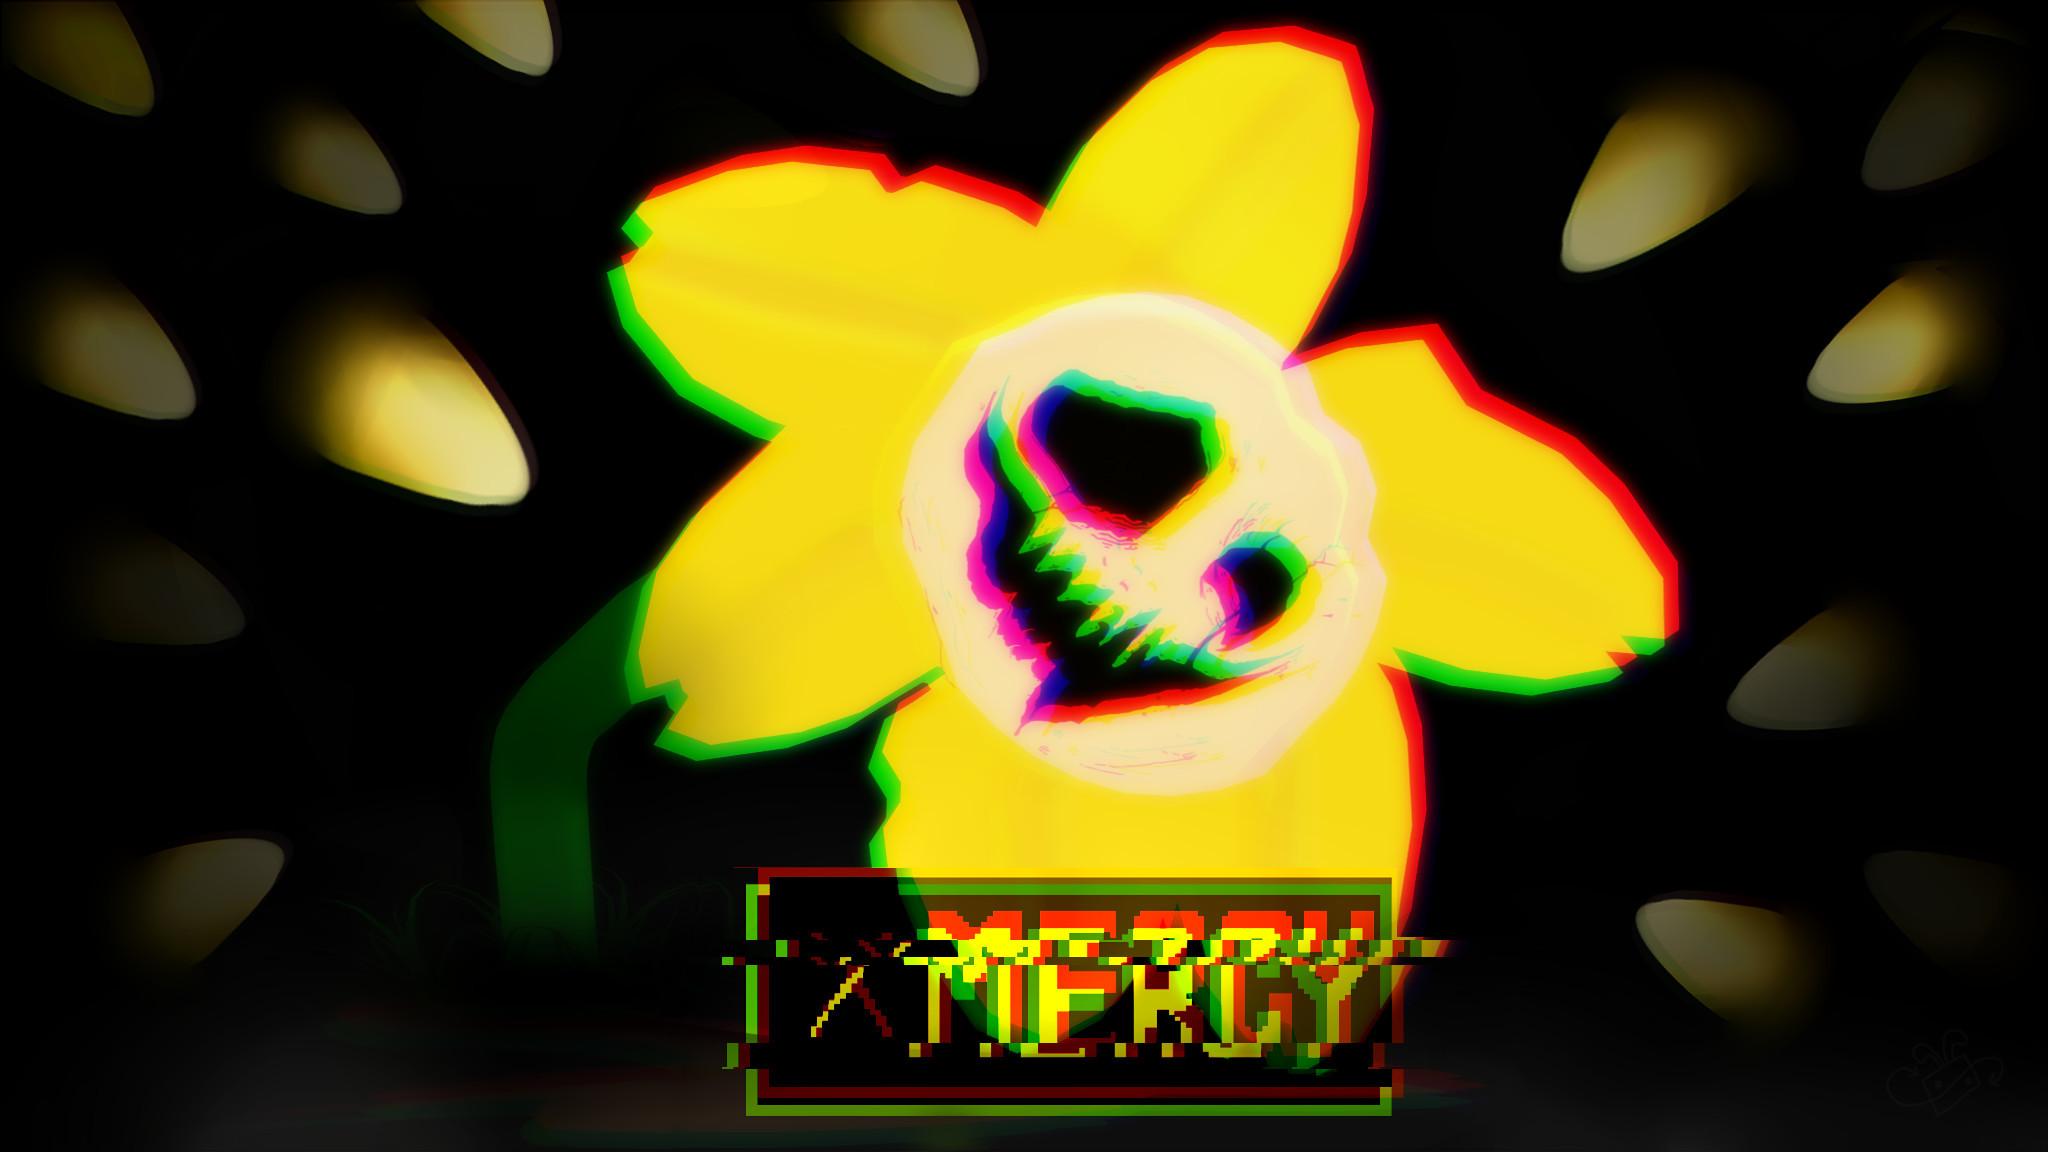 No MERCY – Flowey by PlayerEvil